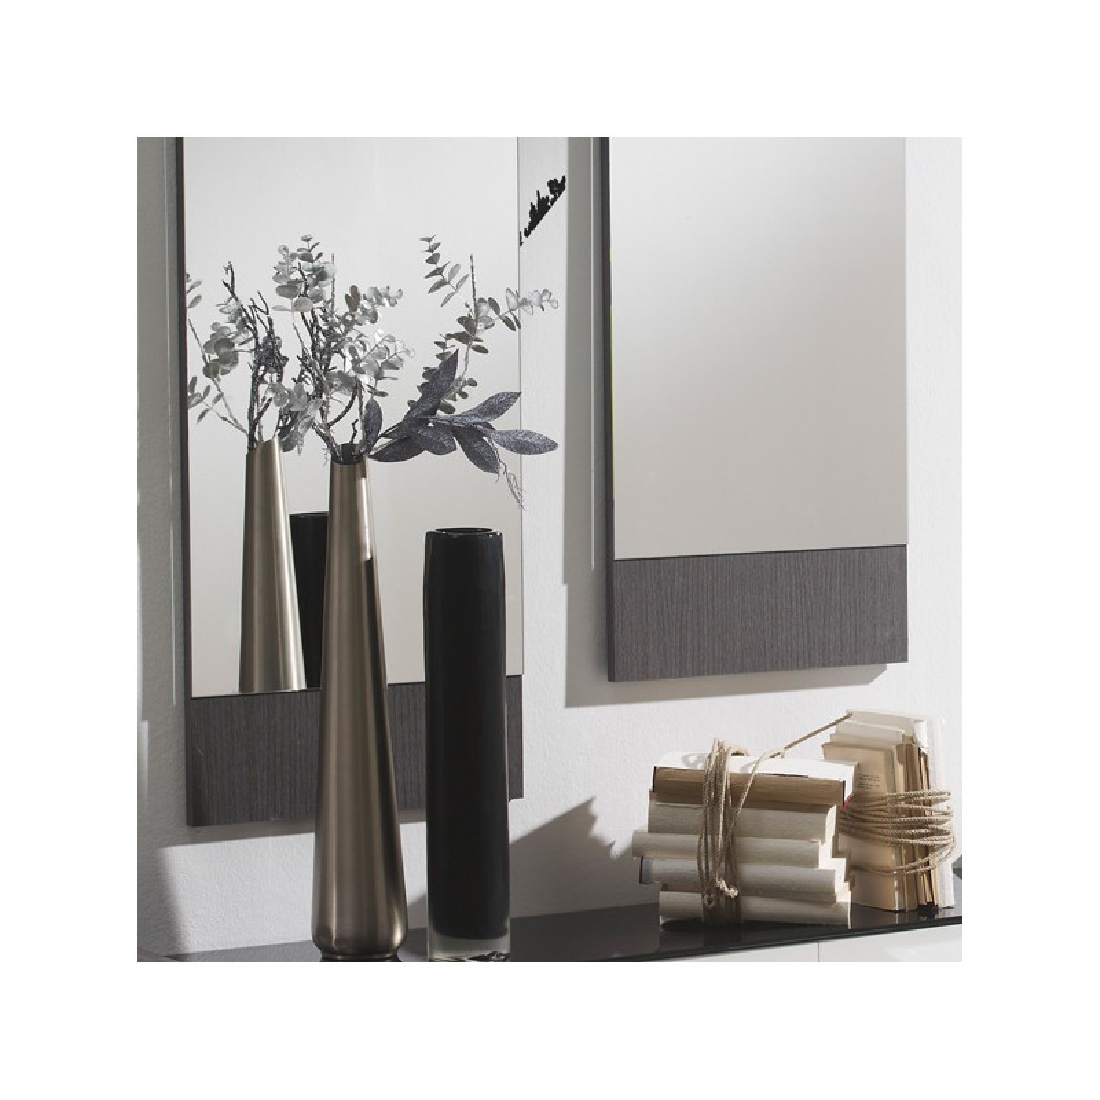 meuble d 39 entr e blanc cendre miroirs millesime petits meubles. Black Bedroom Furniture Sets. Home Design Ideas